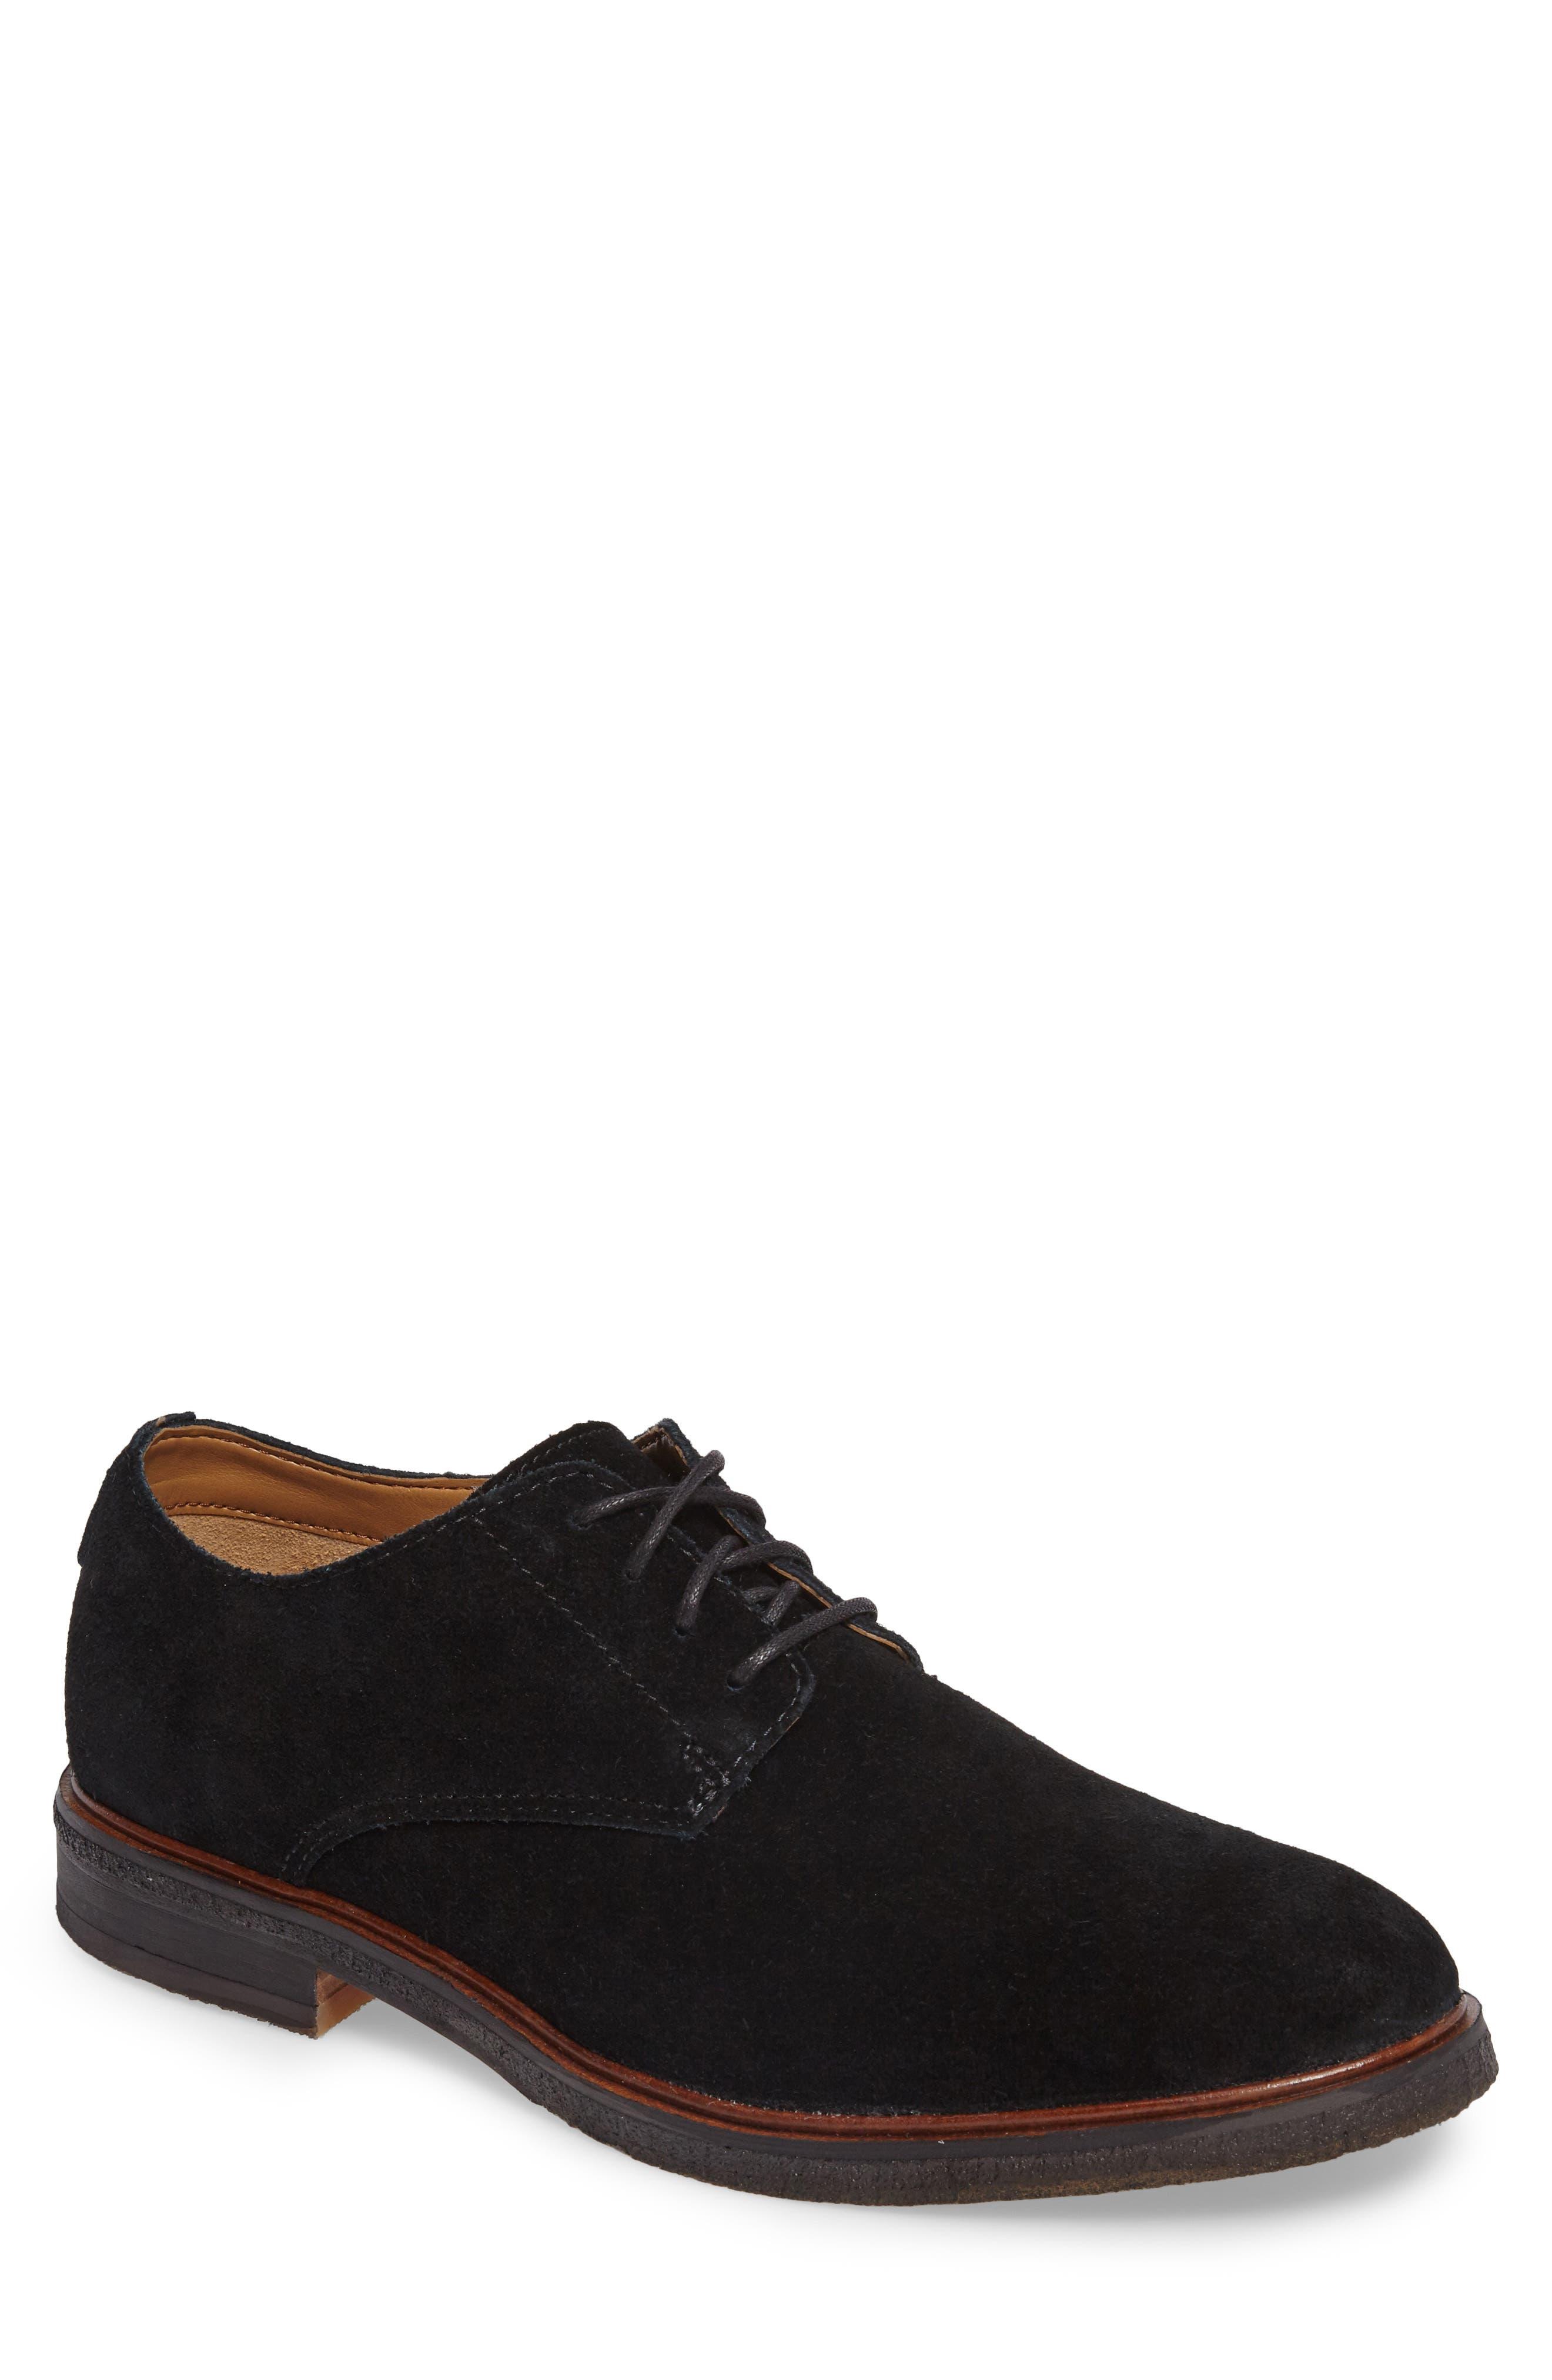 Clarks Clarkdale Moon Buck Shoe,                         Main,                         color, Black Suede